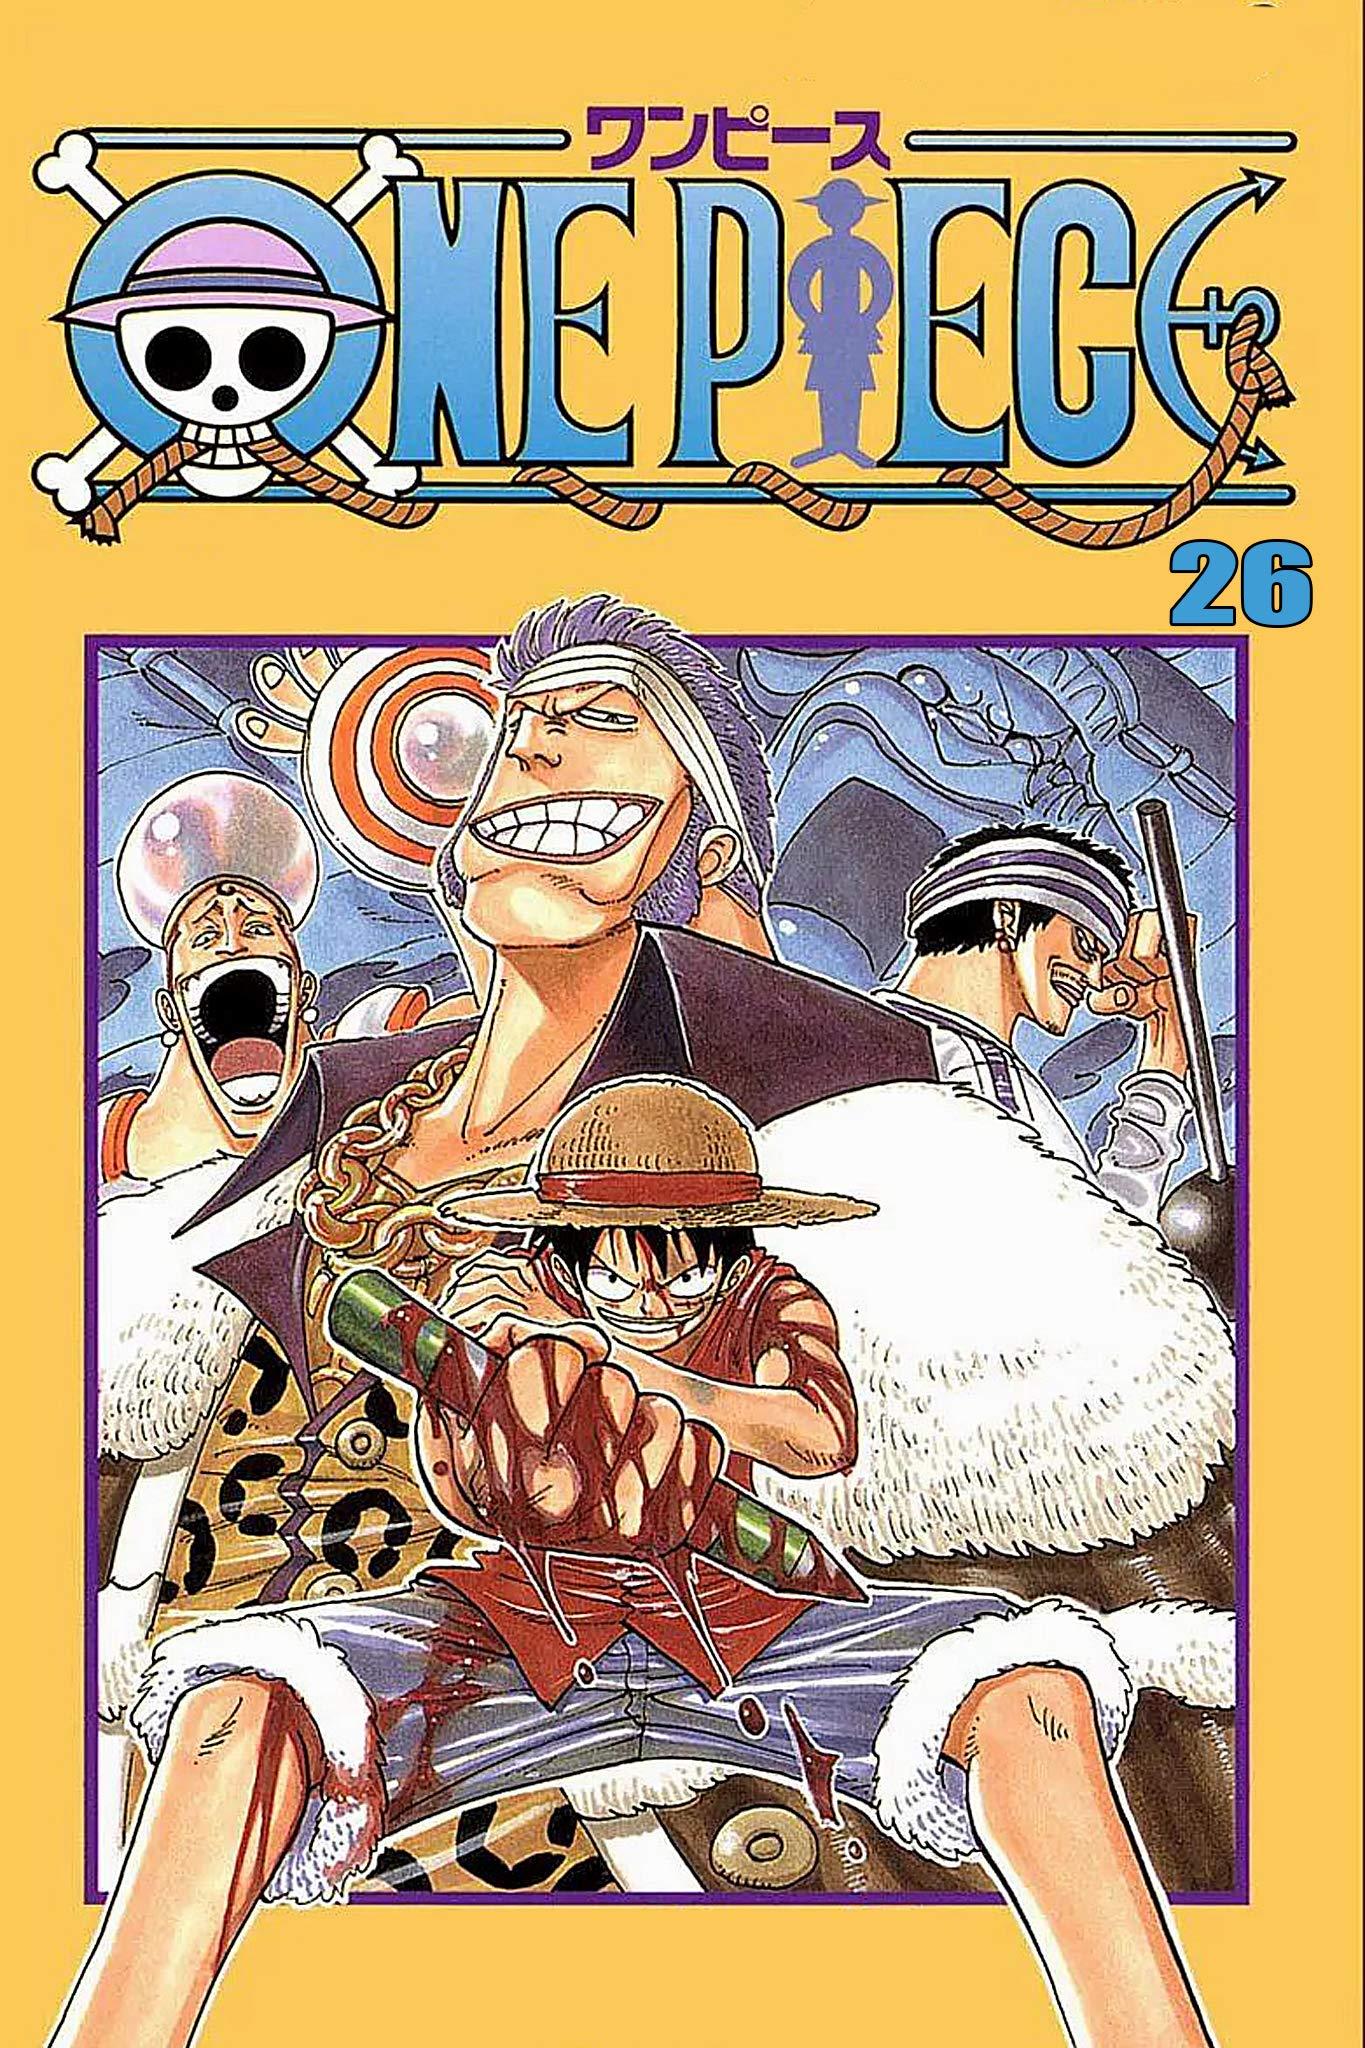 The Best Manga Fantasy: One Piece Full Volume 26